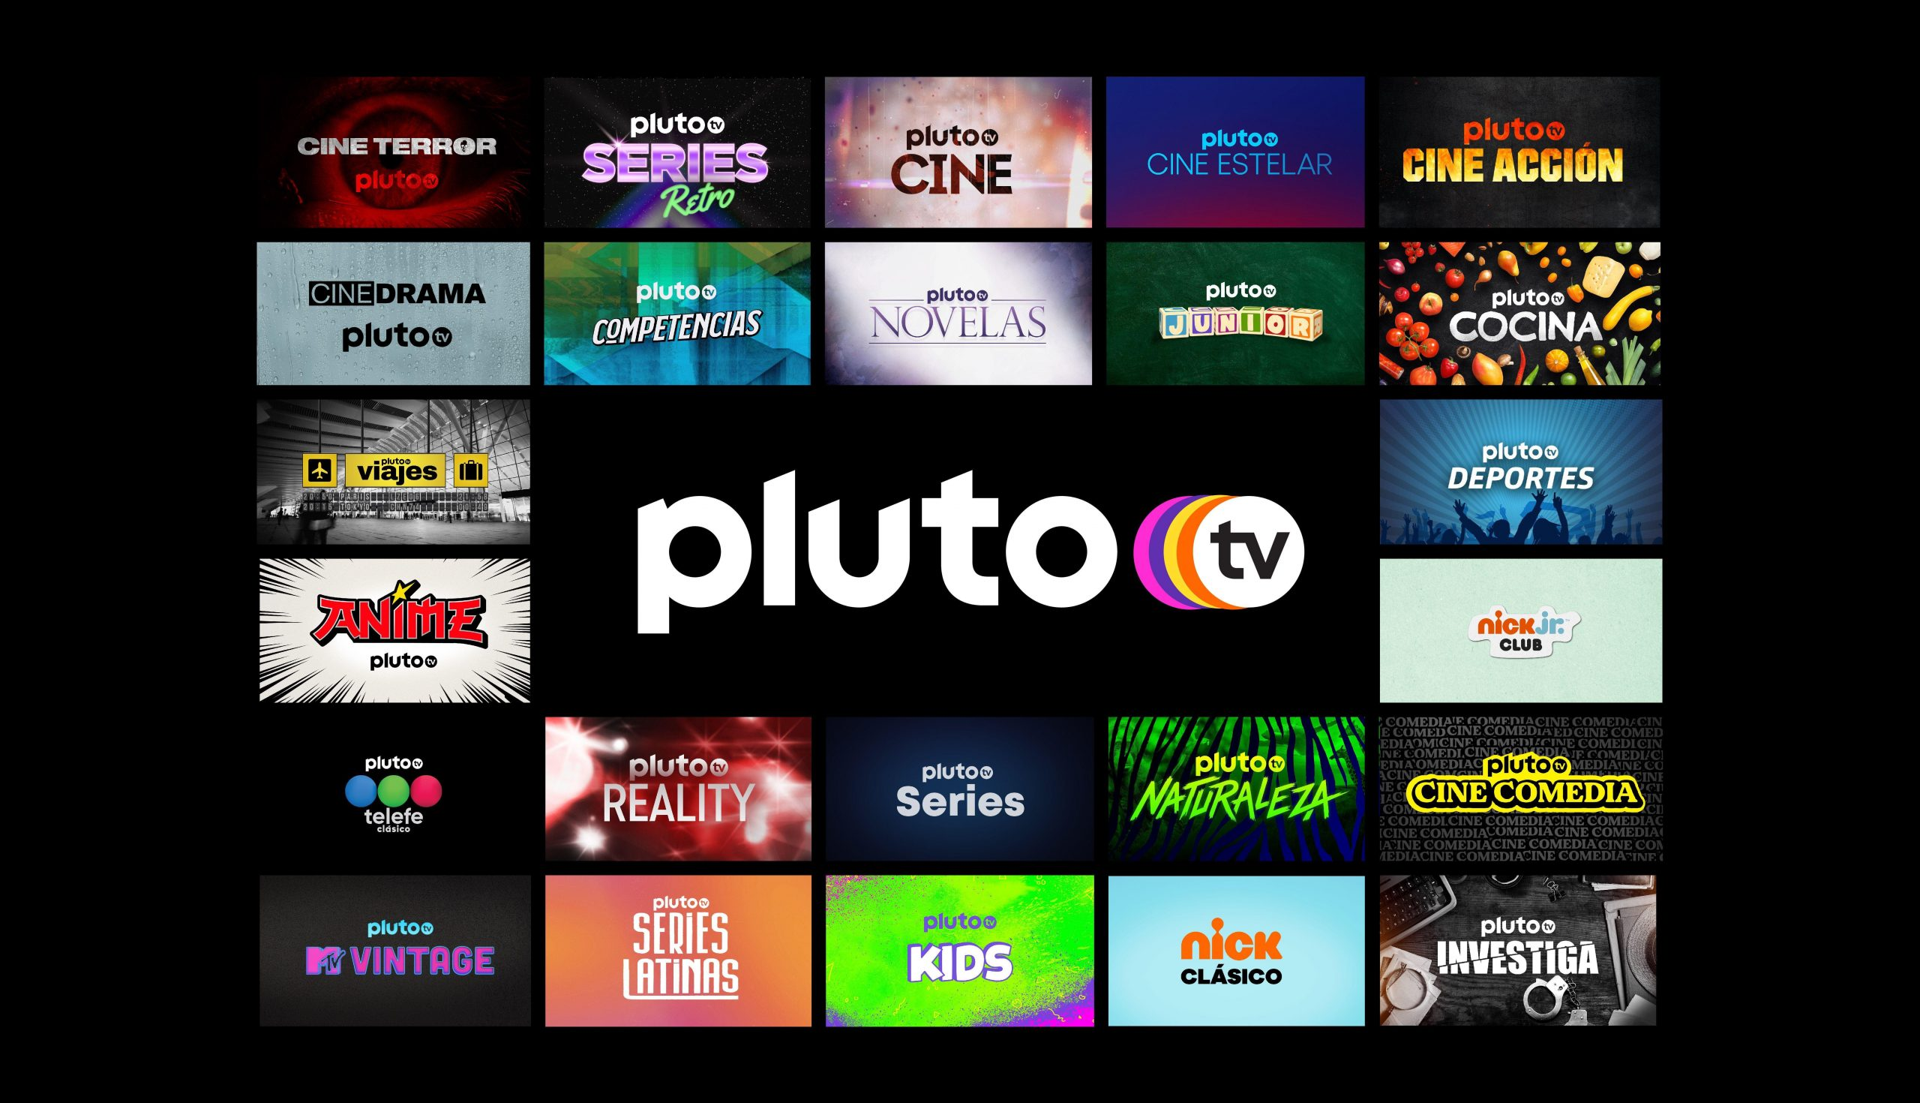 Hisense Pluto Tv